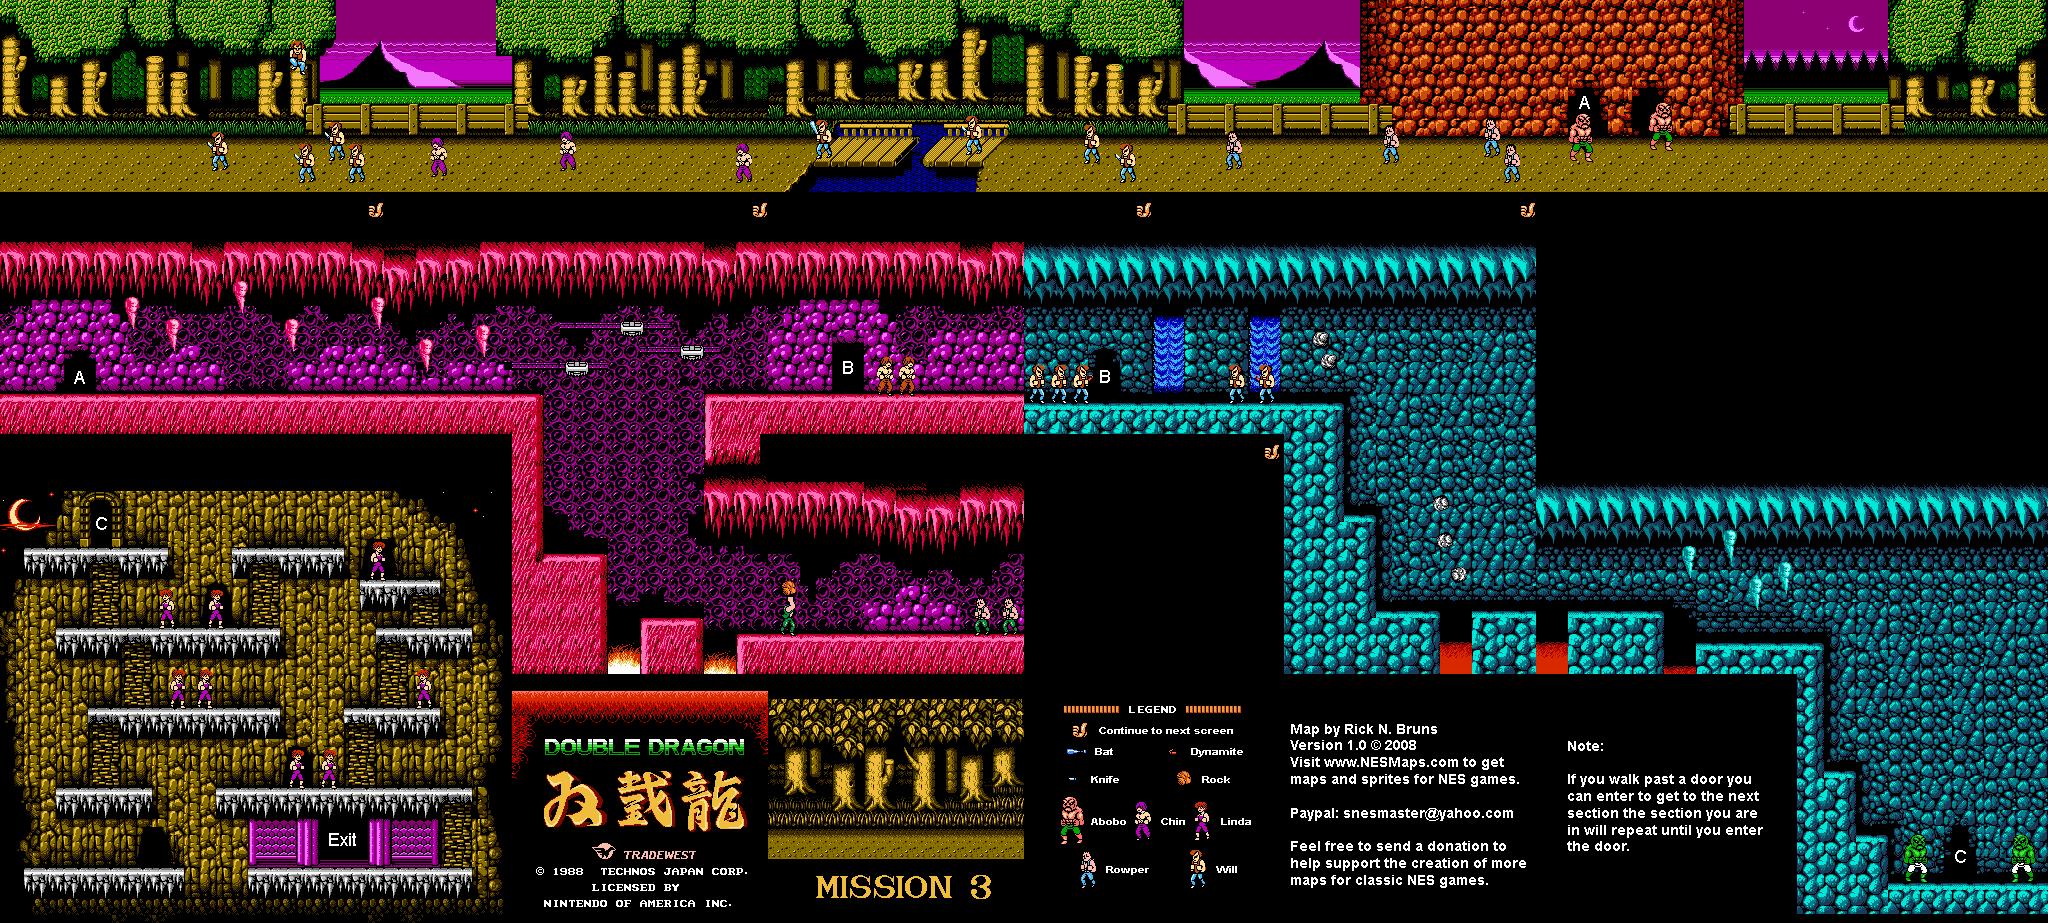 Double Dragon - Mission 3 Nintendo NES Map